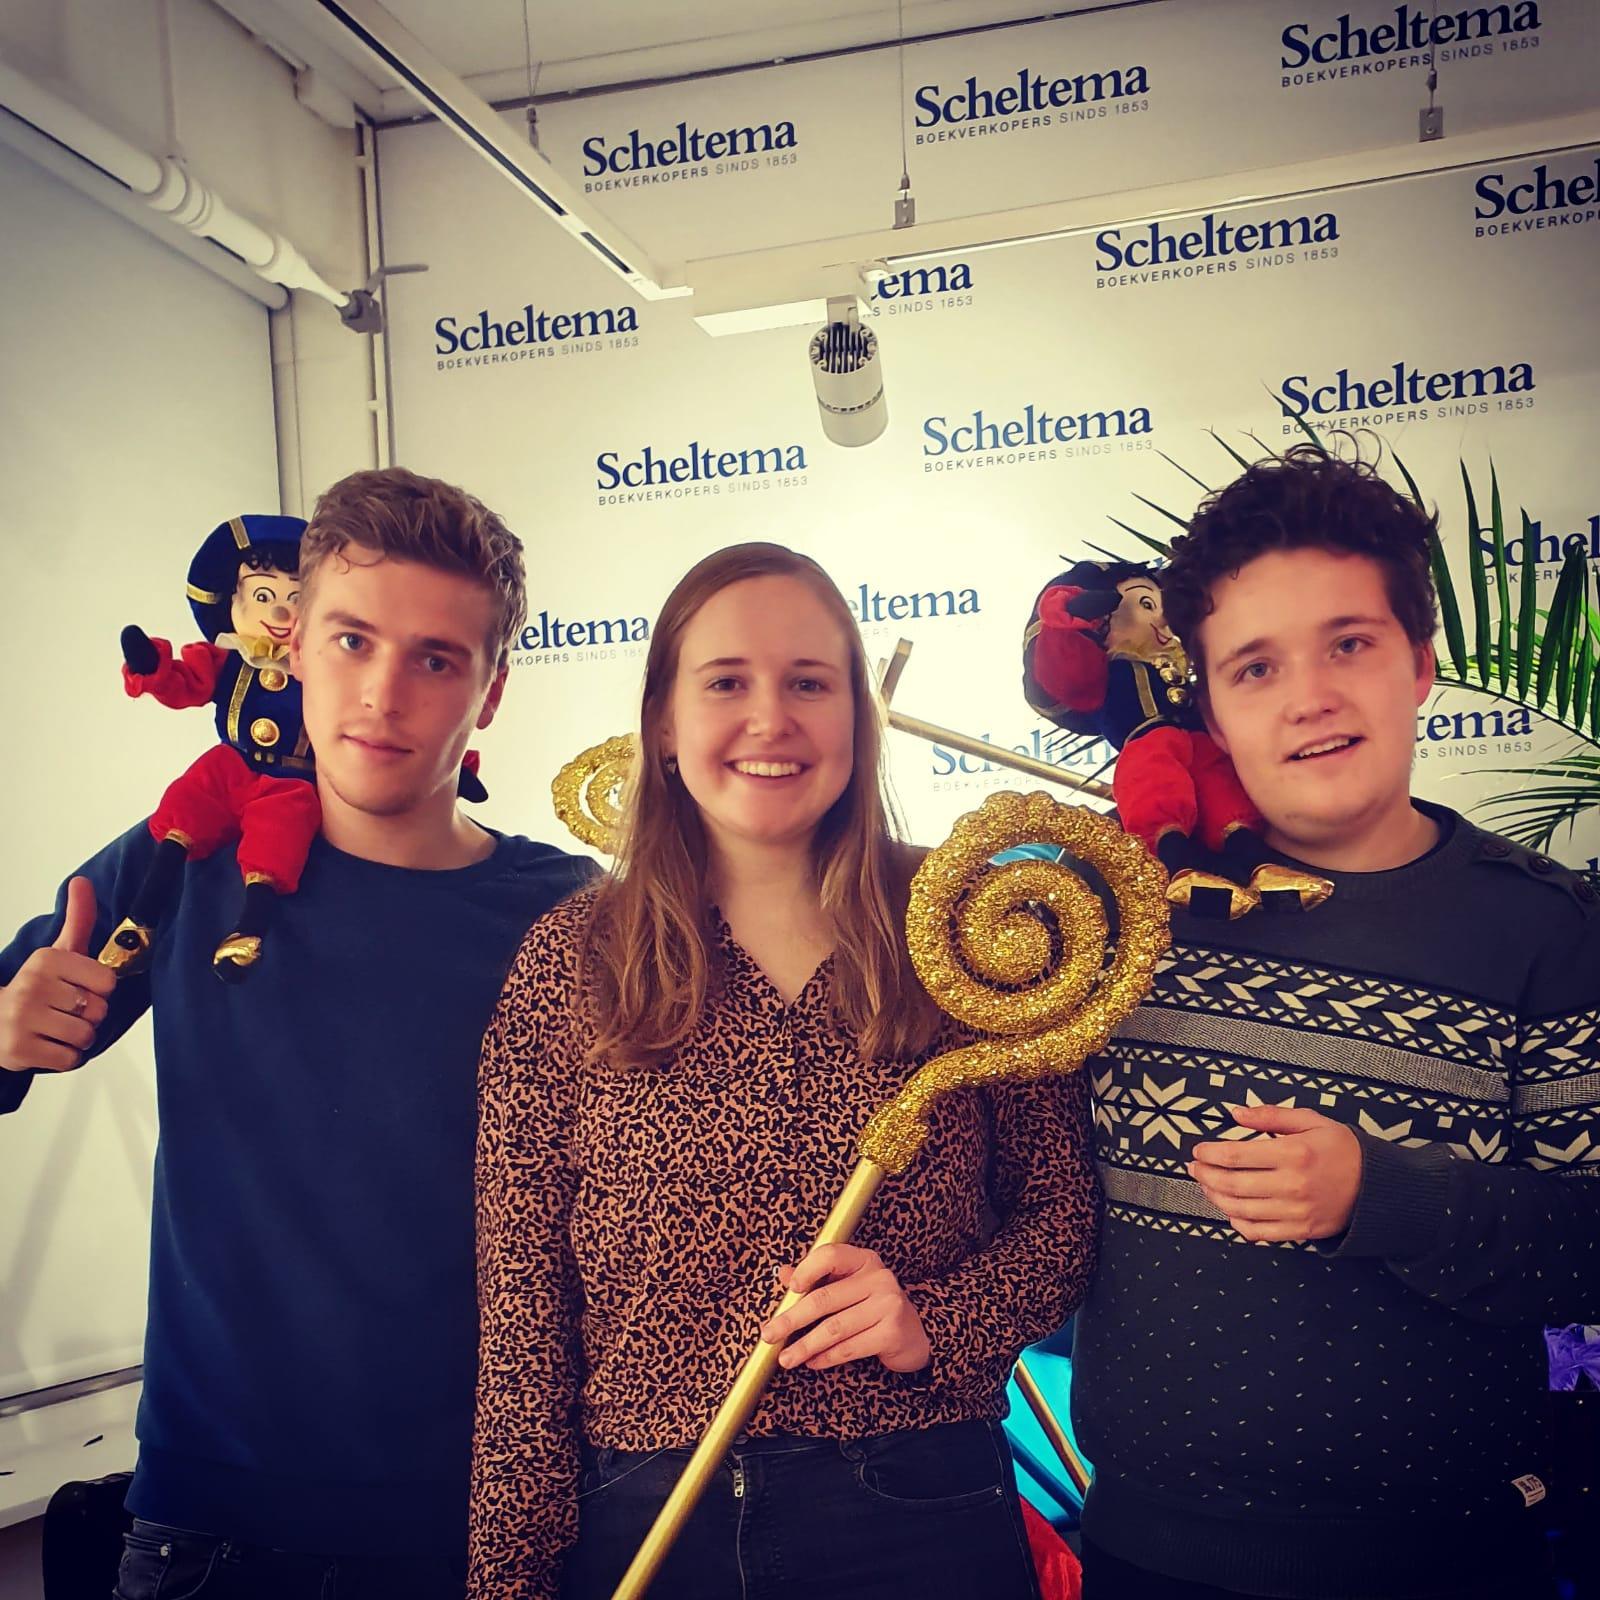 De Jonge Amsterdammer Sinterklaas Special #20: Lotte van Drie